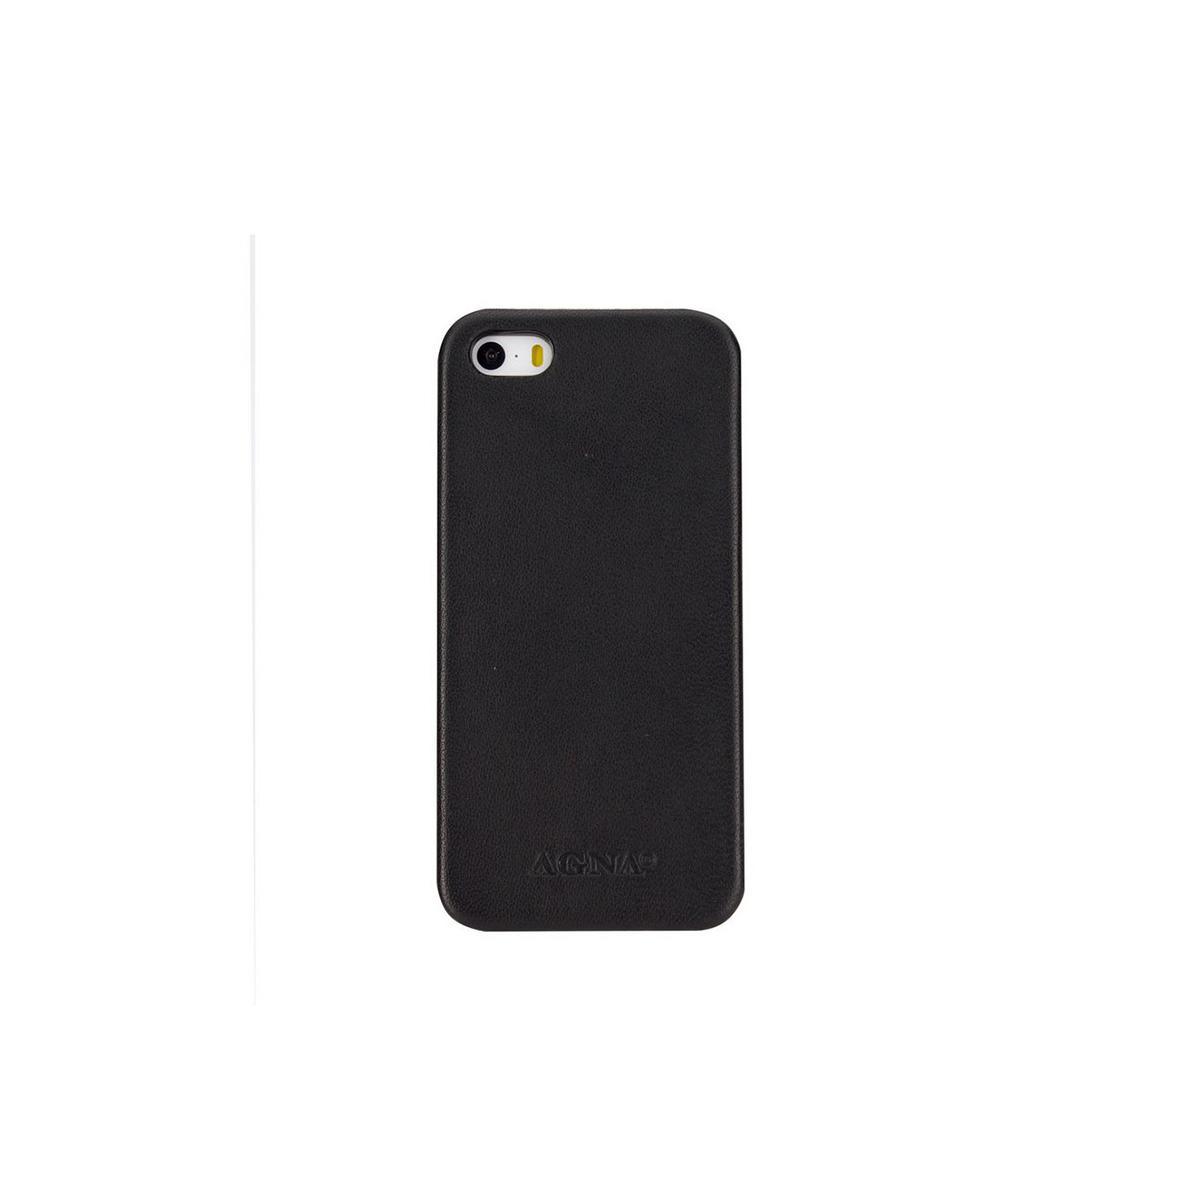 Agna iPhone iPlate Real Leather чехол e9db6d7f73967